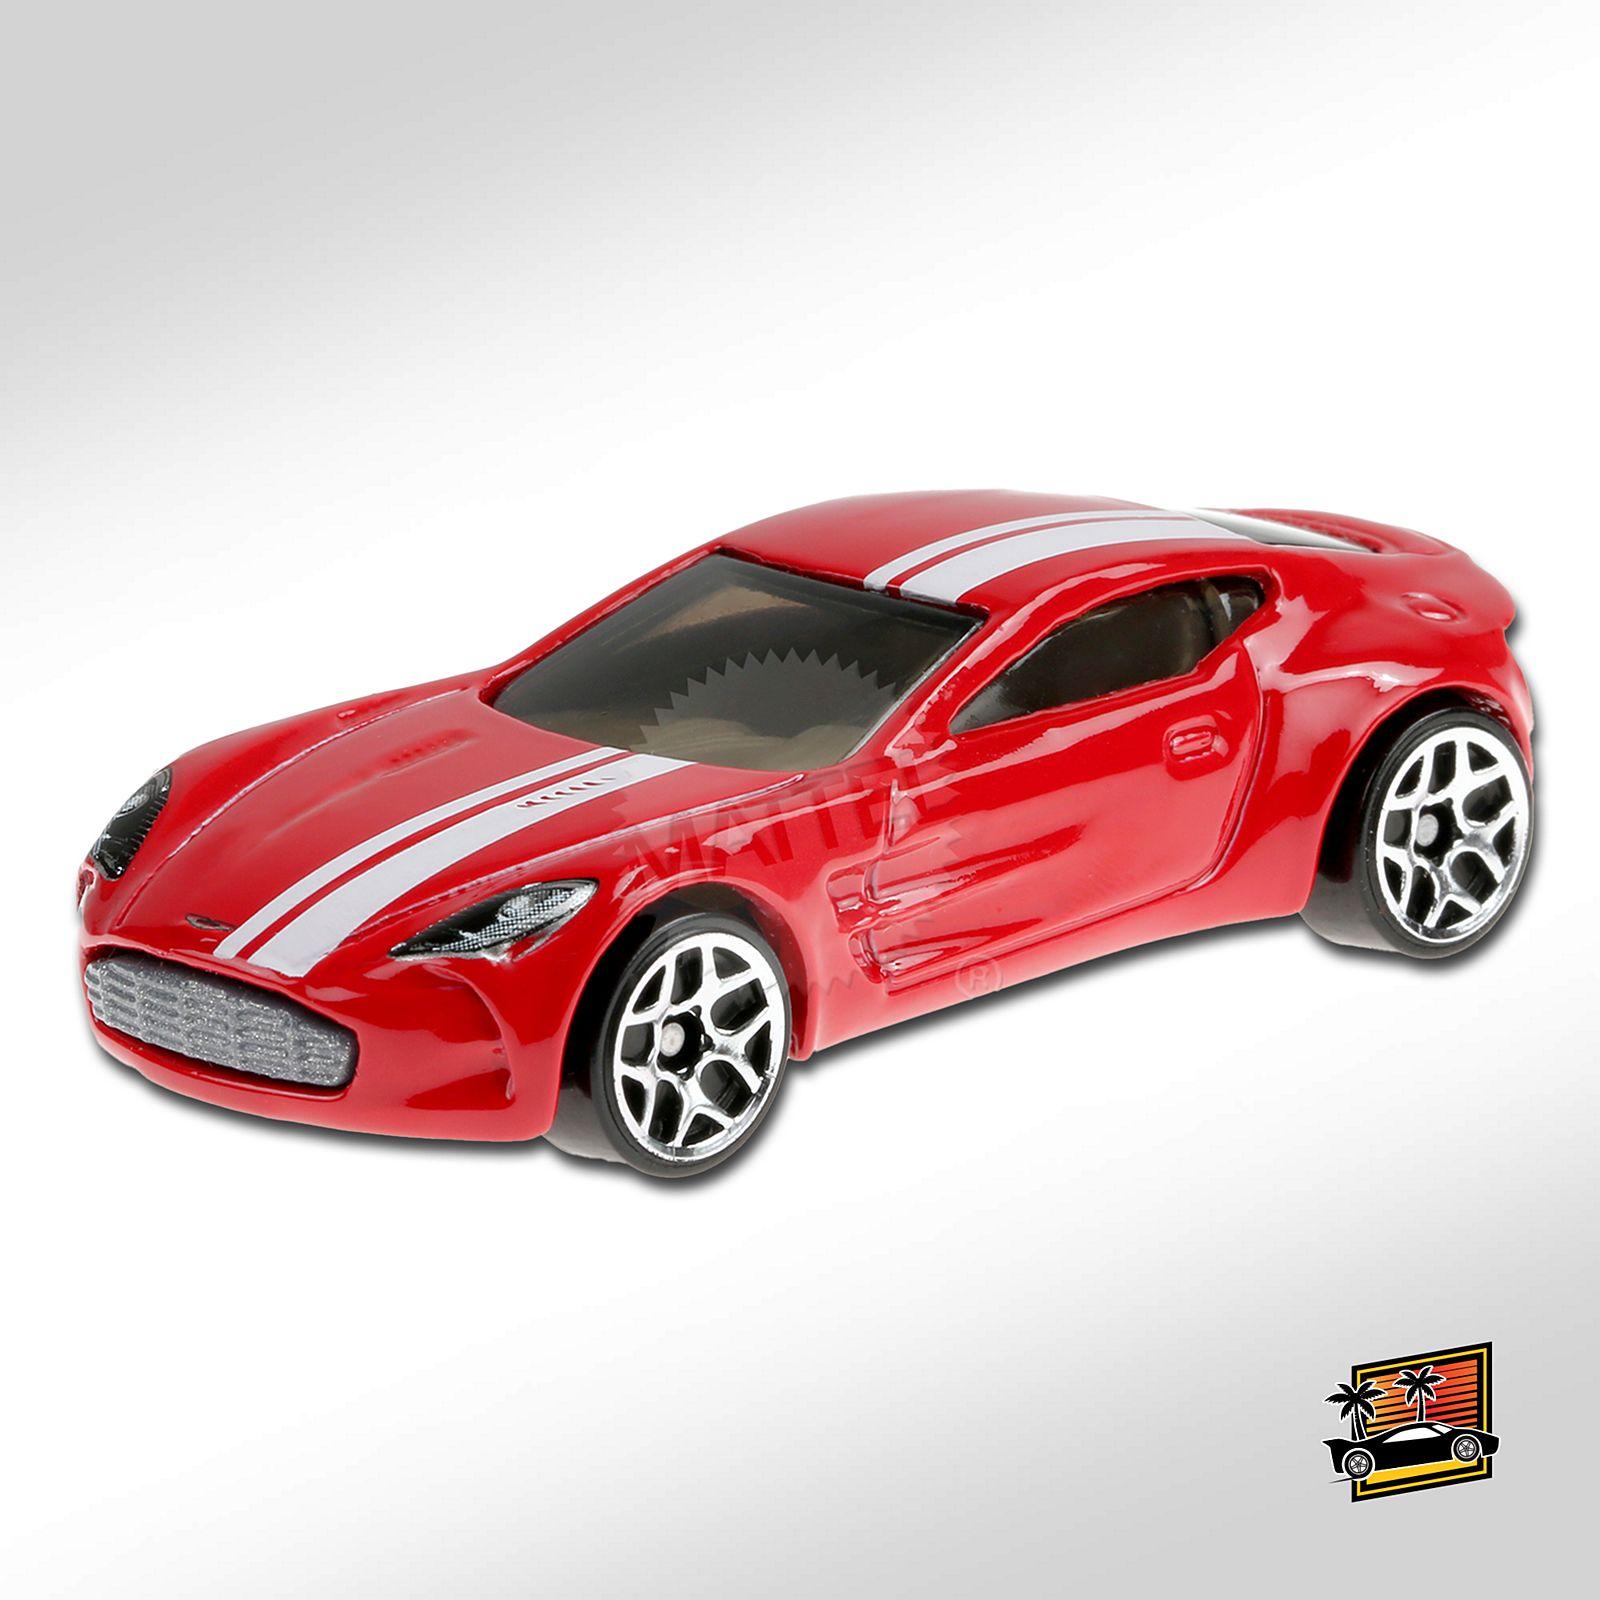 Carrinho Hot Wheels: Aston Martin One-77 (OFGUJ) Hw Exotics - Mattel